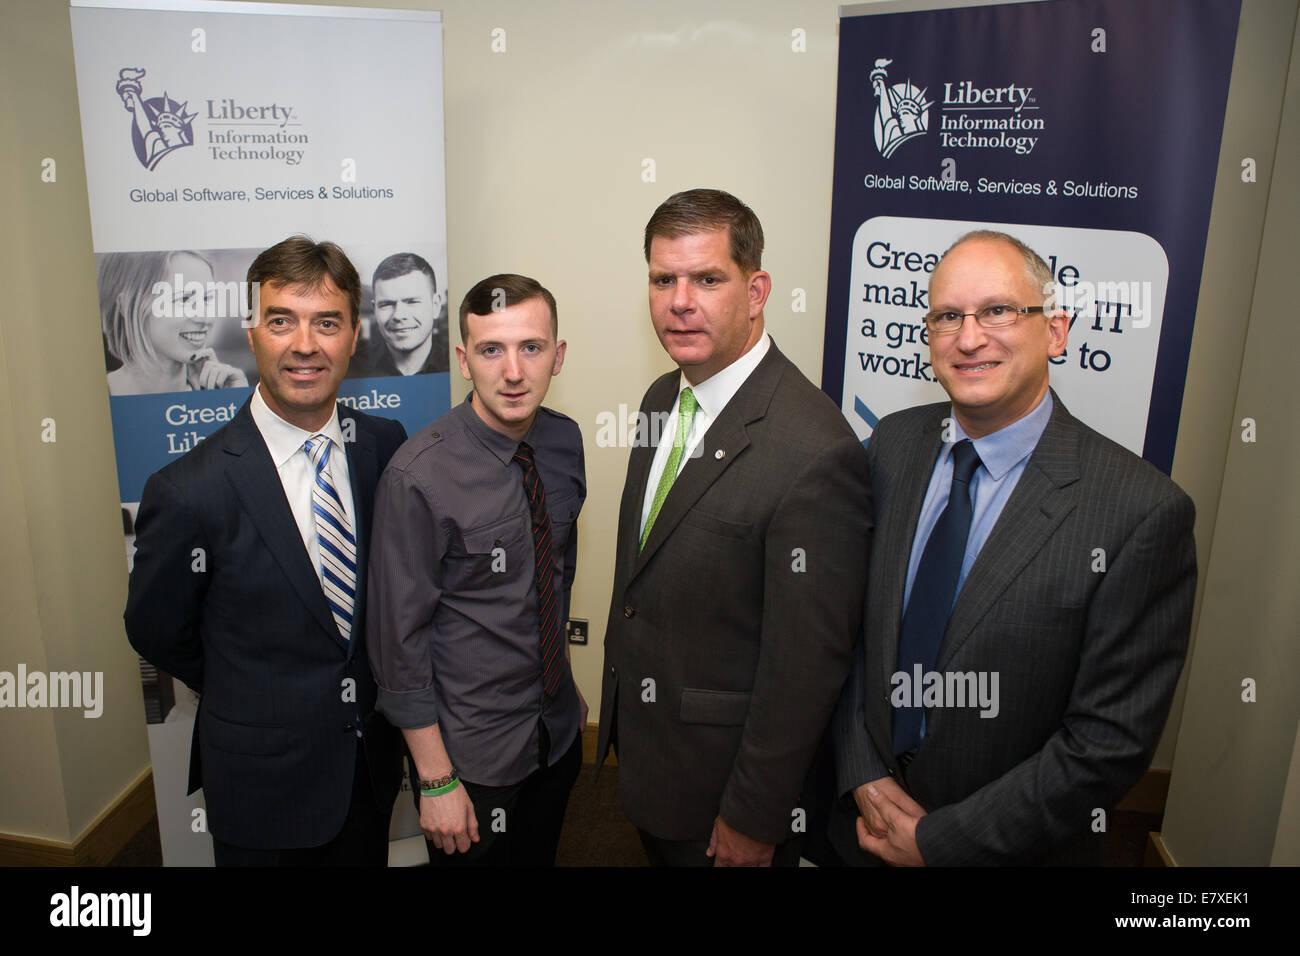 Belfast, Ireland. 25th September, 2014. Boston Mayor Marty Walsh,William Hamilton, Managing Director, Liberty IT - Stock Image